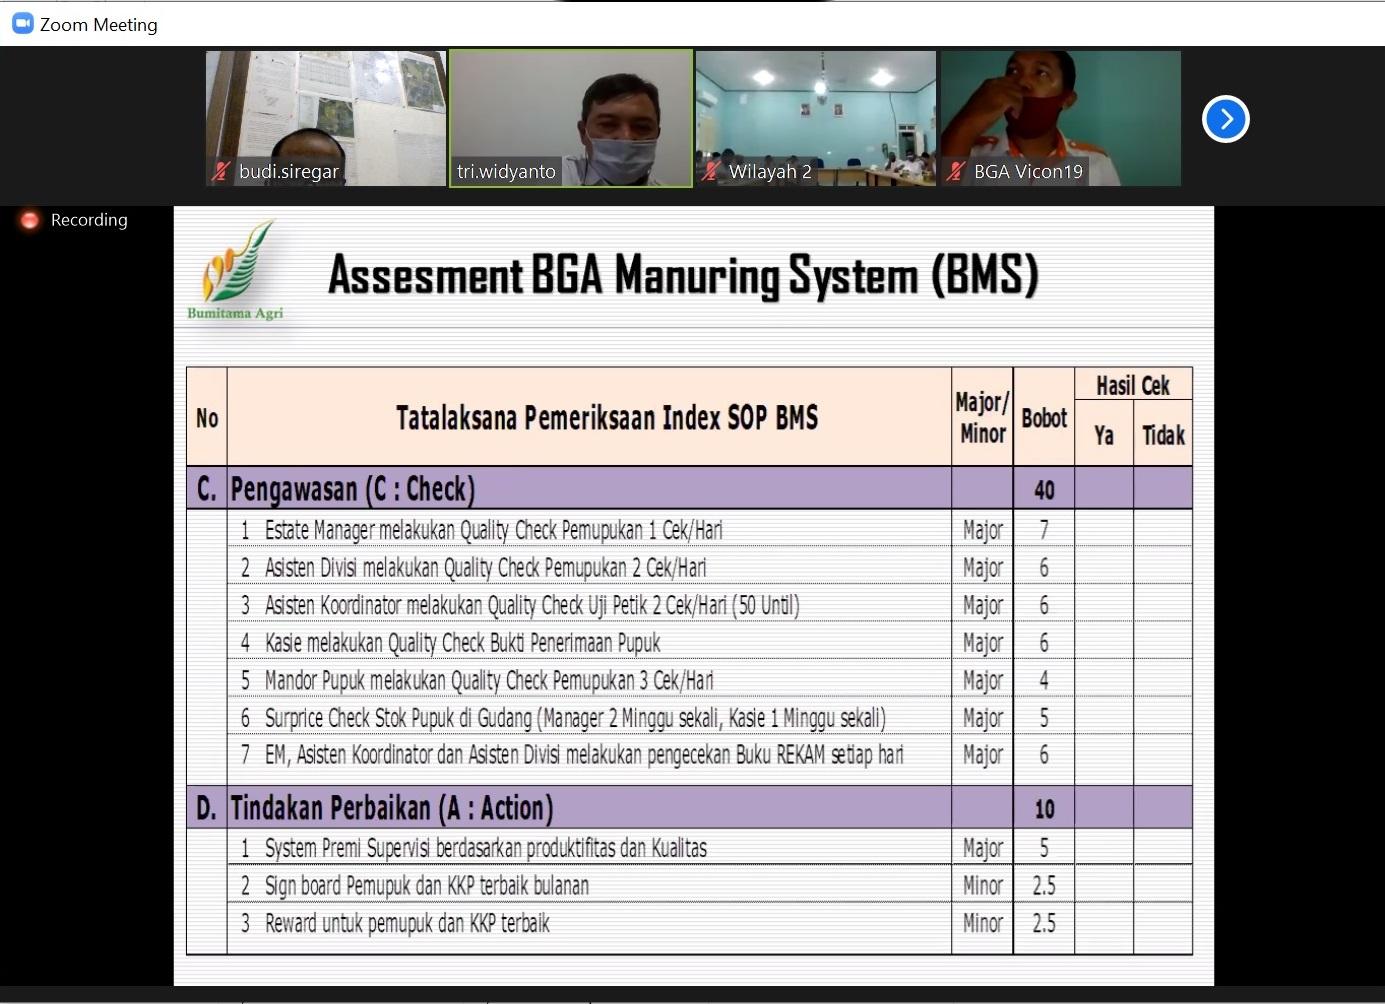 Asesment BMS - Disiplin Indeks SOP BMS - Check dan Action